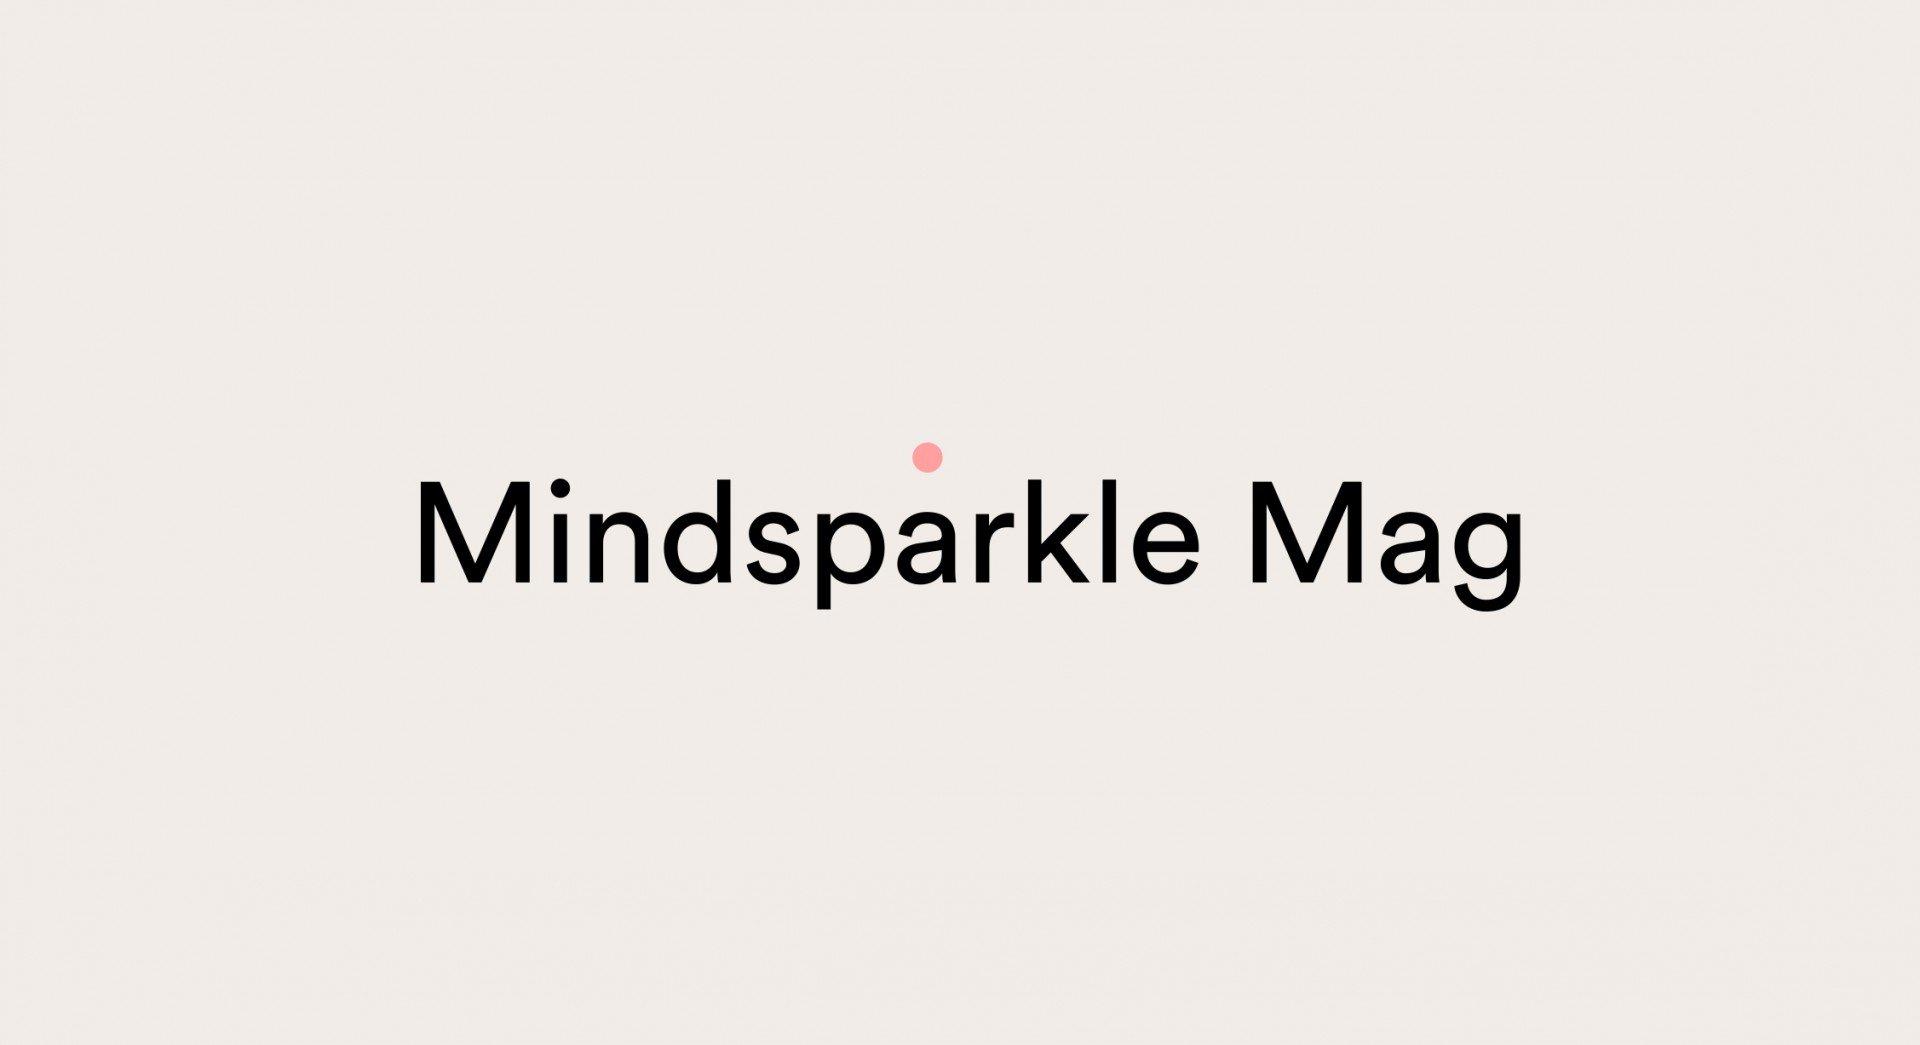 Mindsparkle magazine – Brand Identity homm